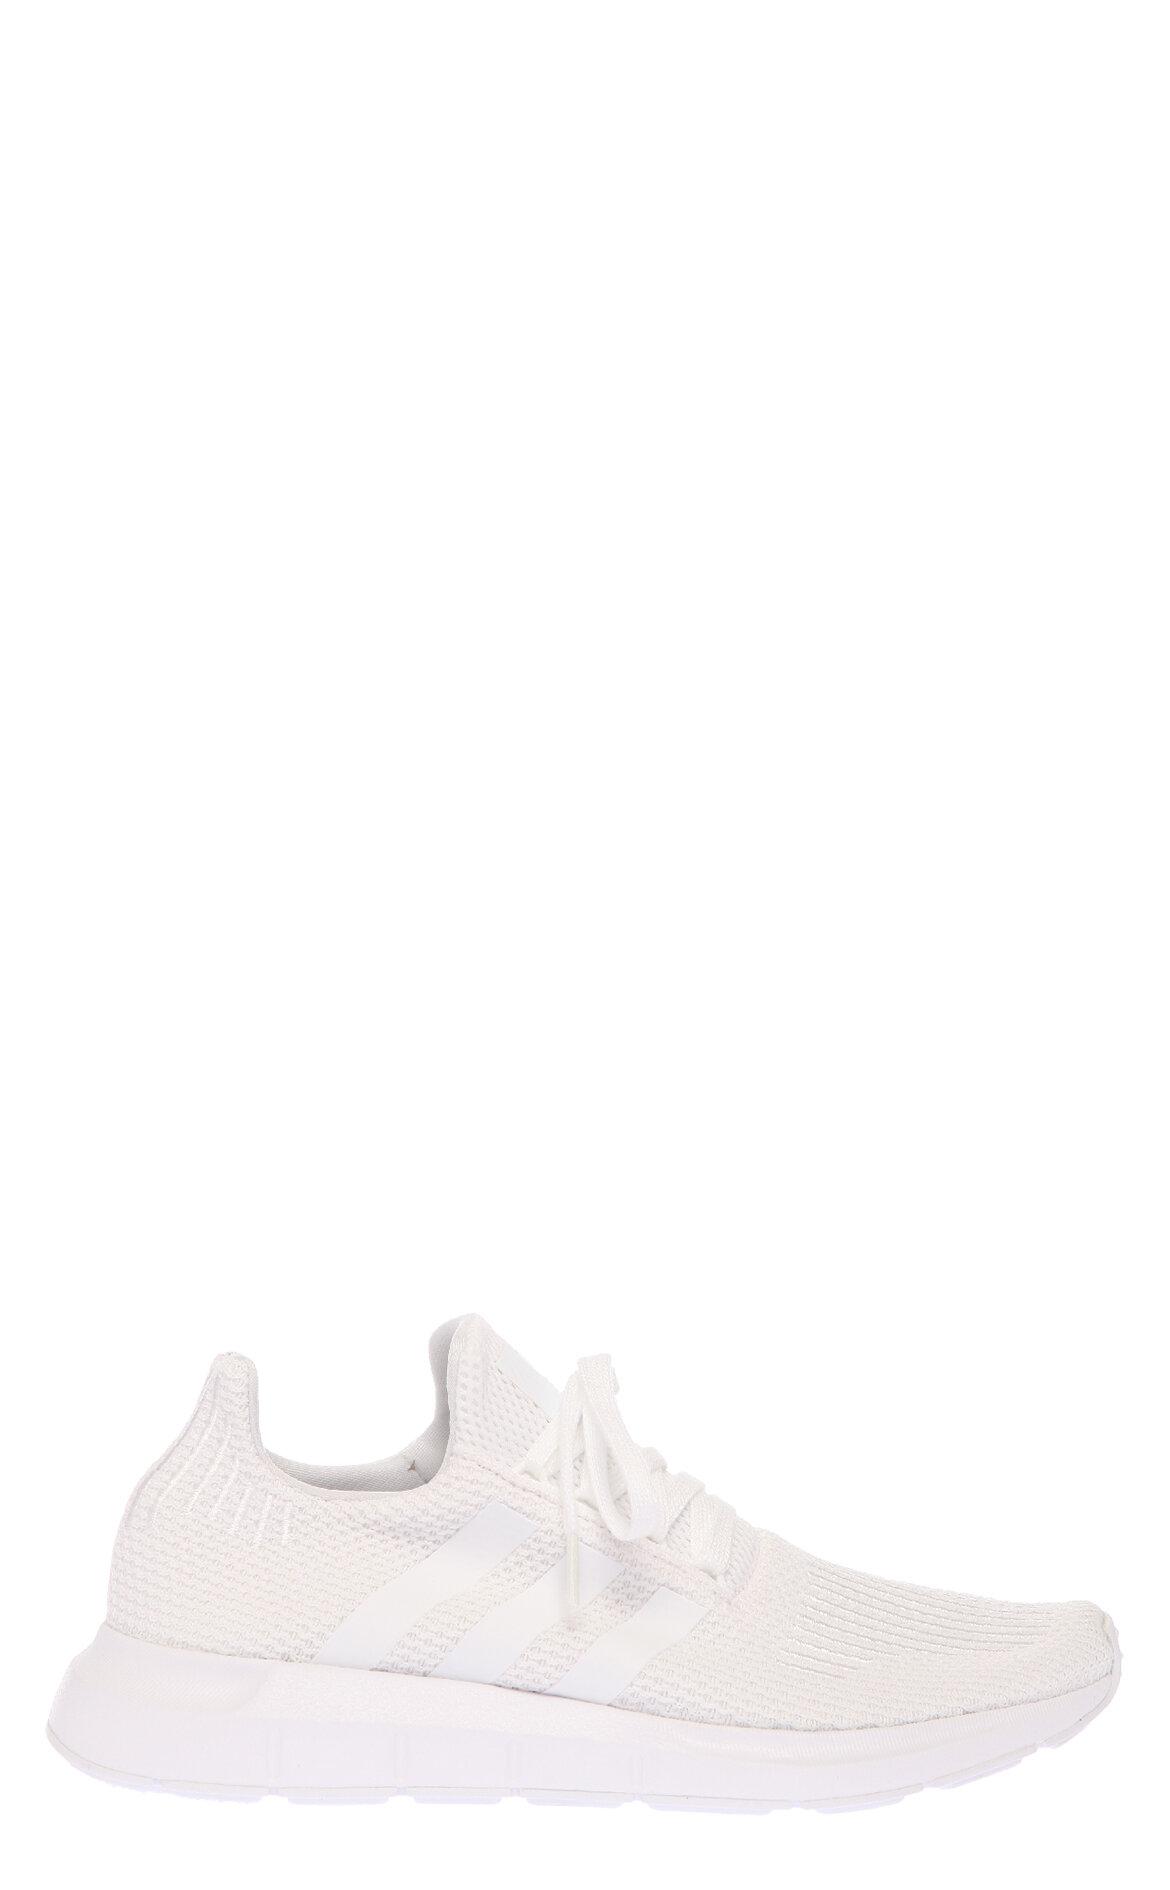 adidas originals Swift Run Ayakkabı